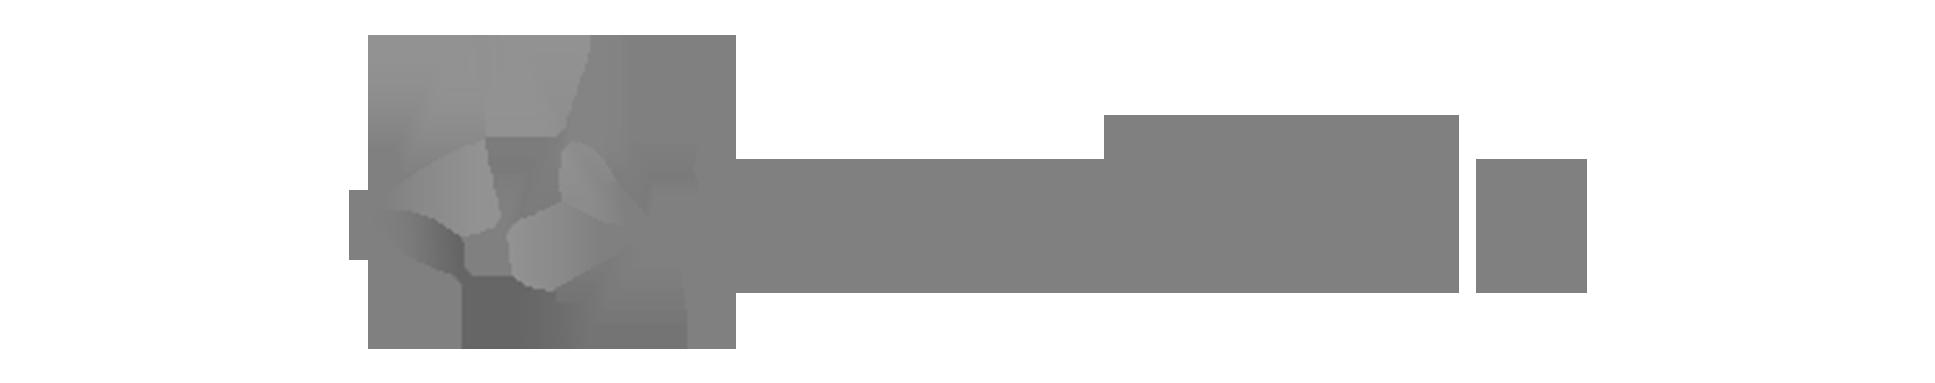 avanade-bw